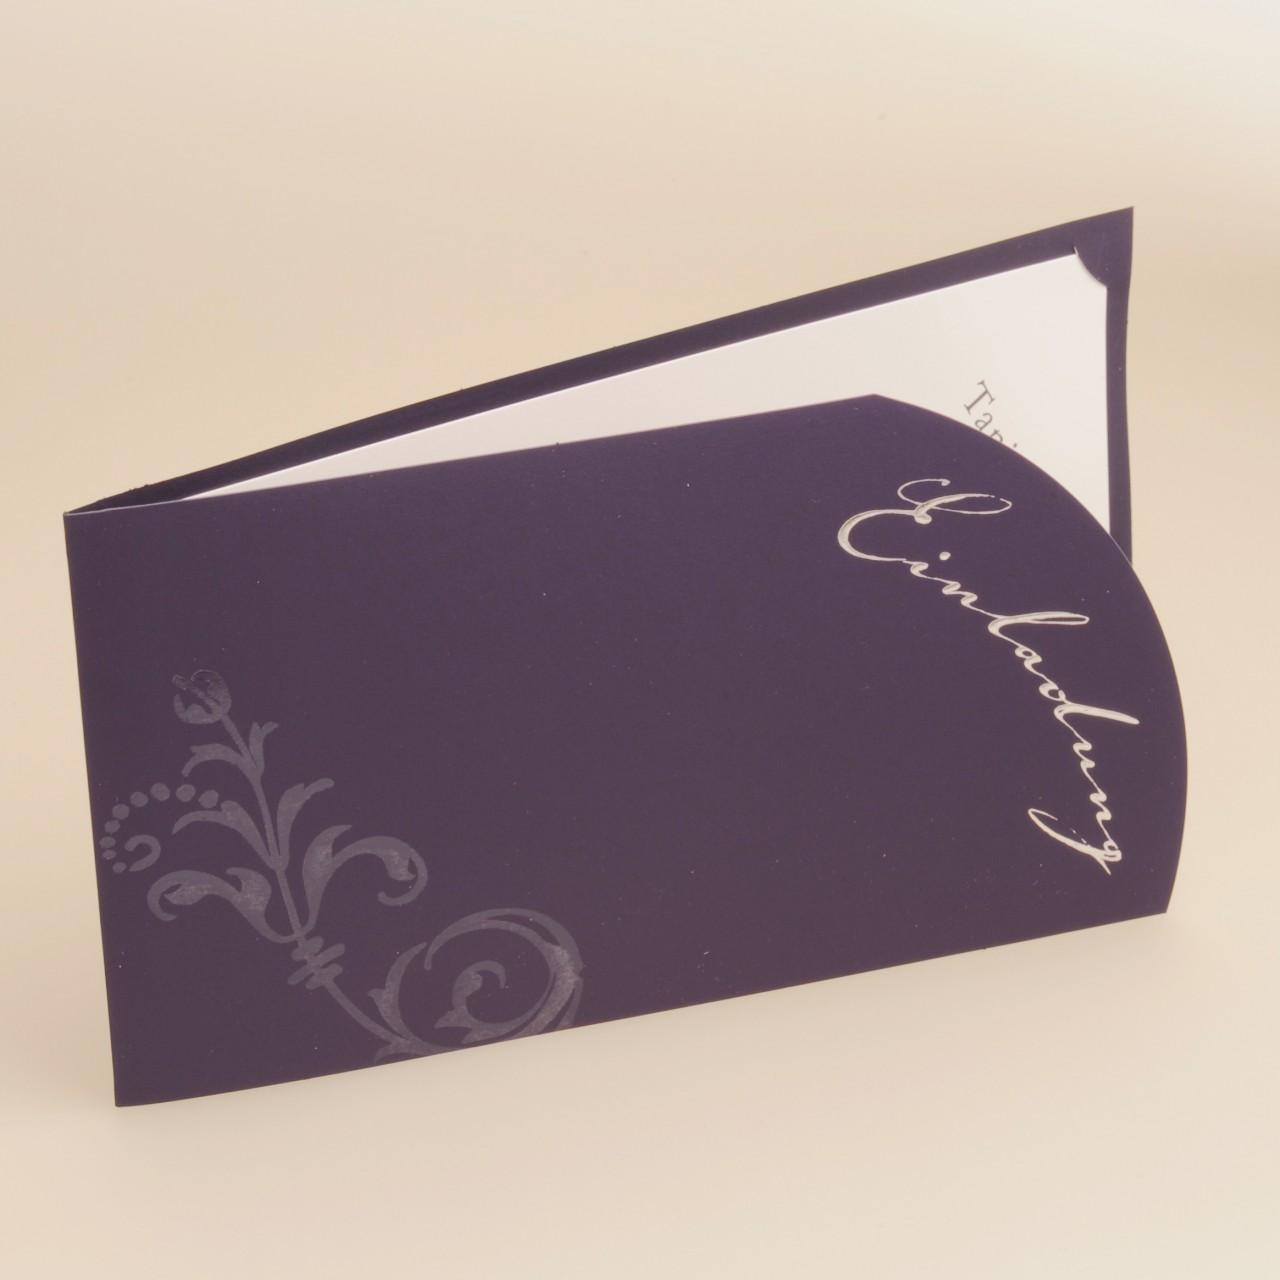 Einladungskarte - H 1800